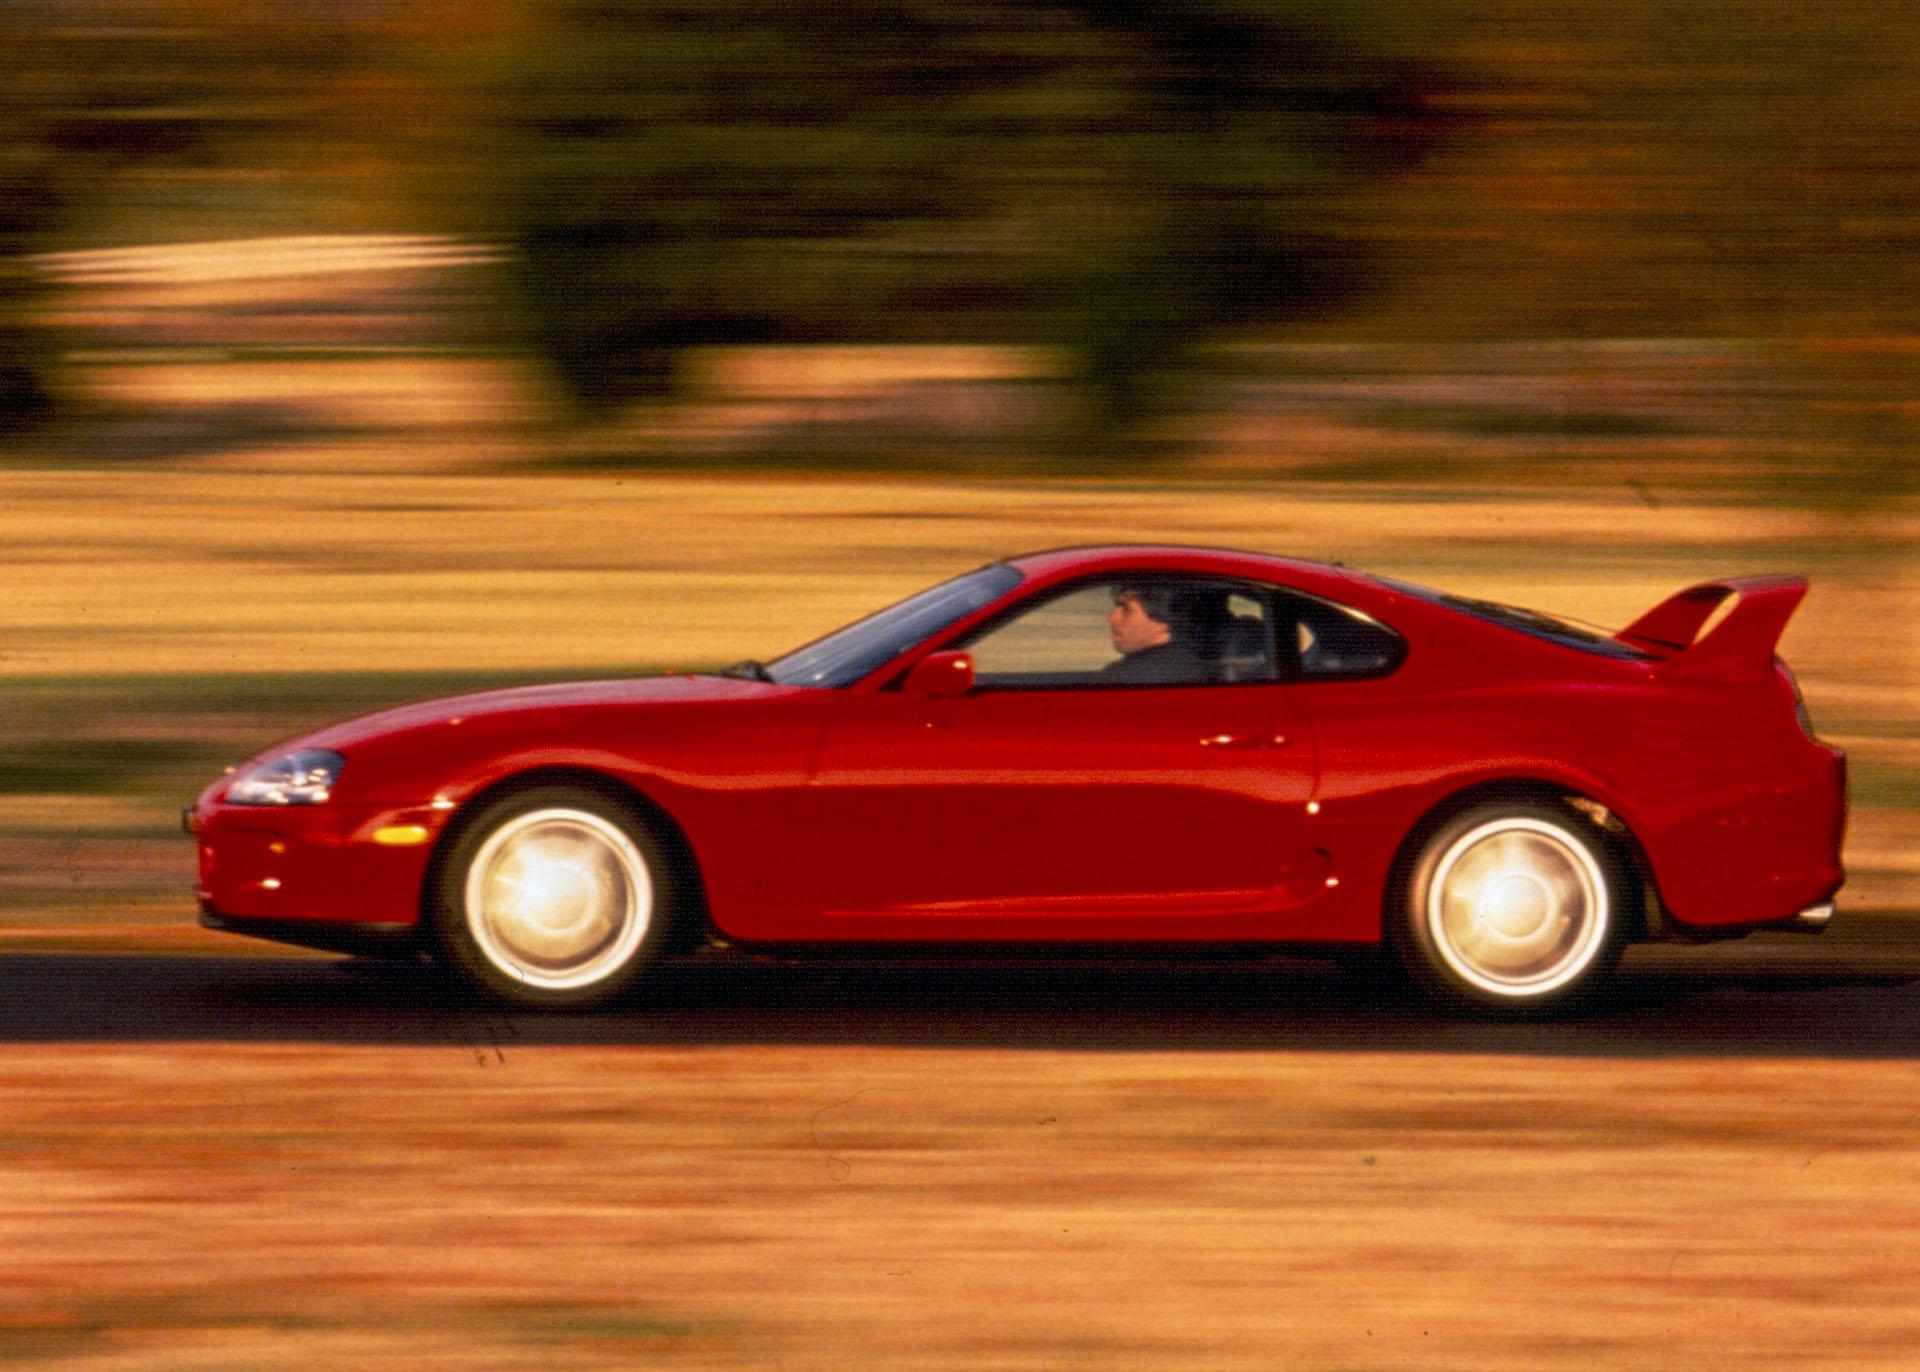 Red fourth generation Toyota